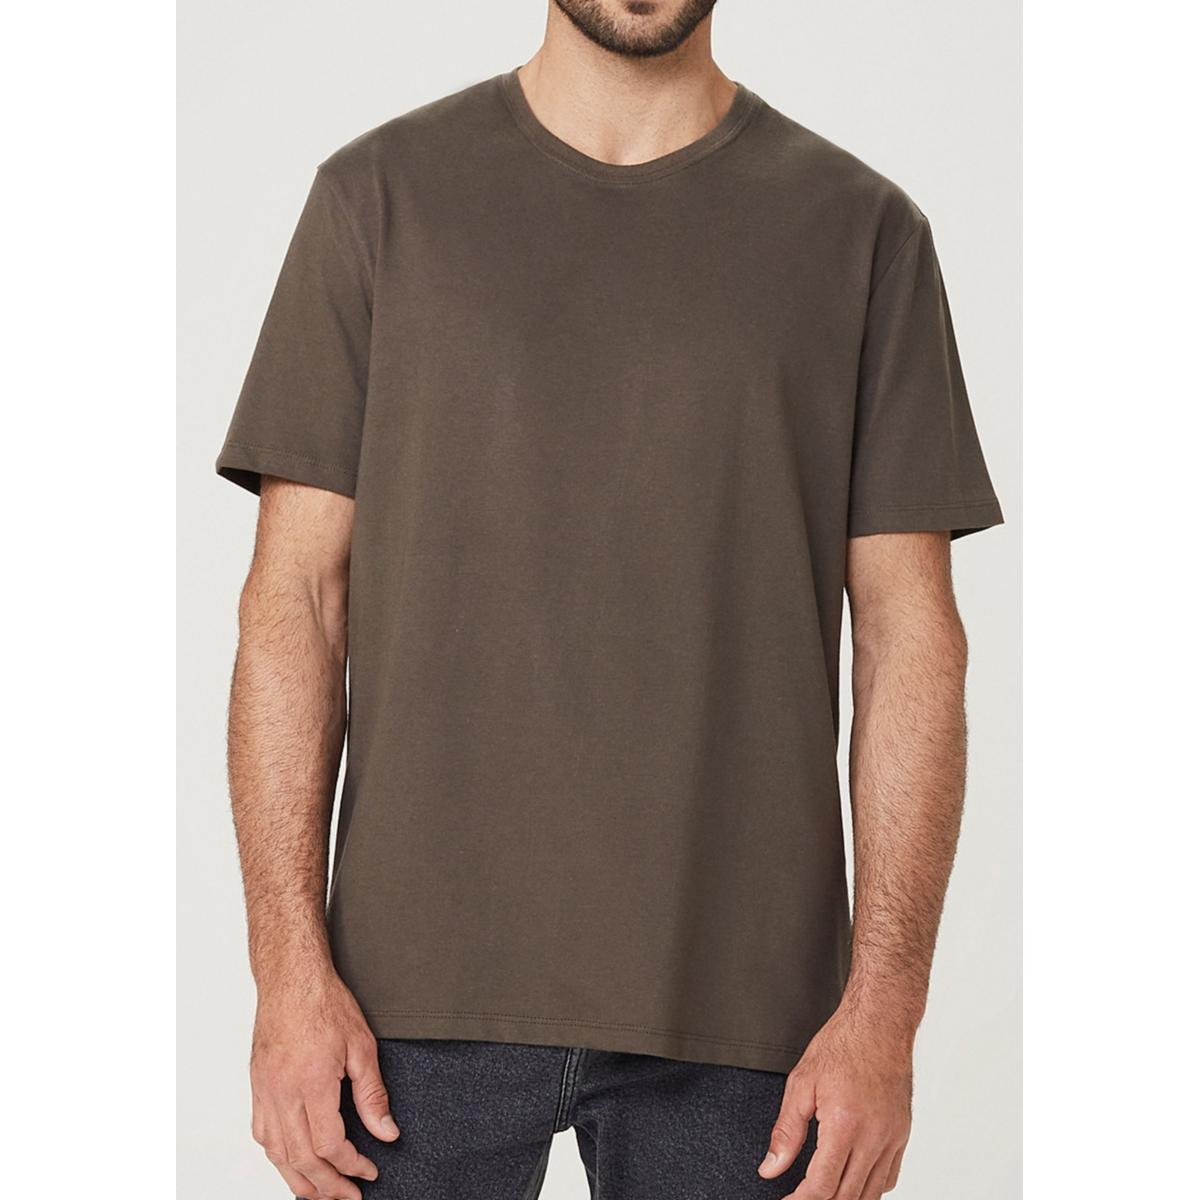 Camiseta Masculina Hering 0227 Naten Verde